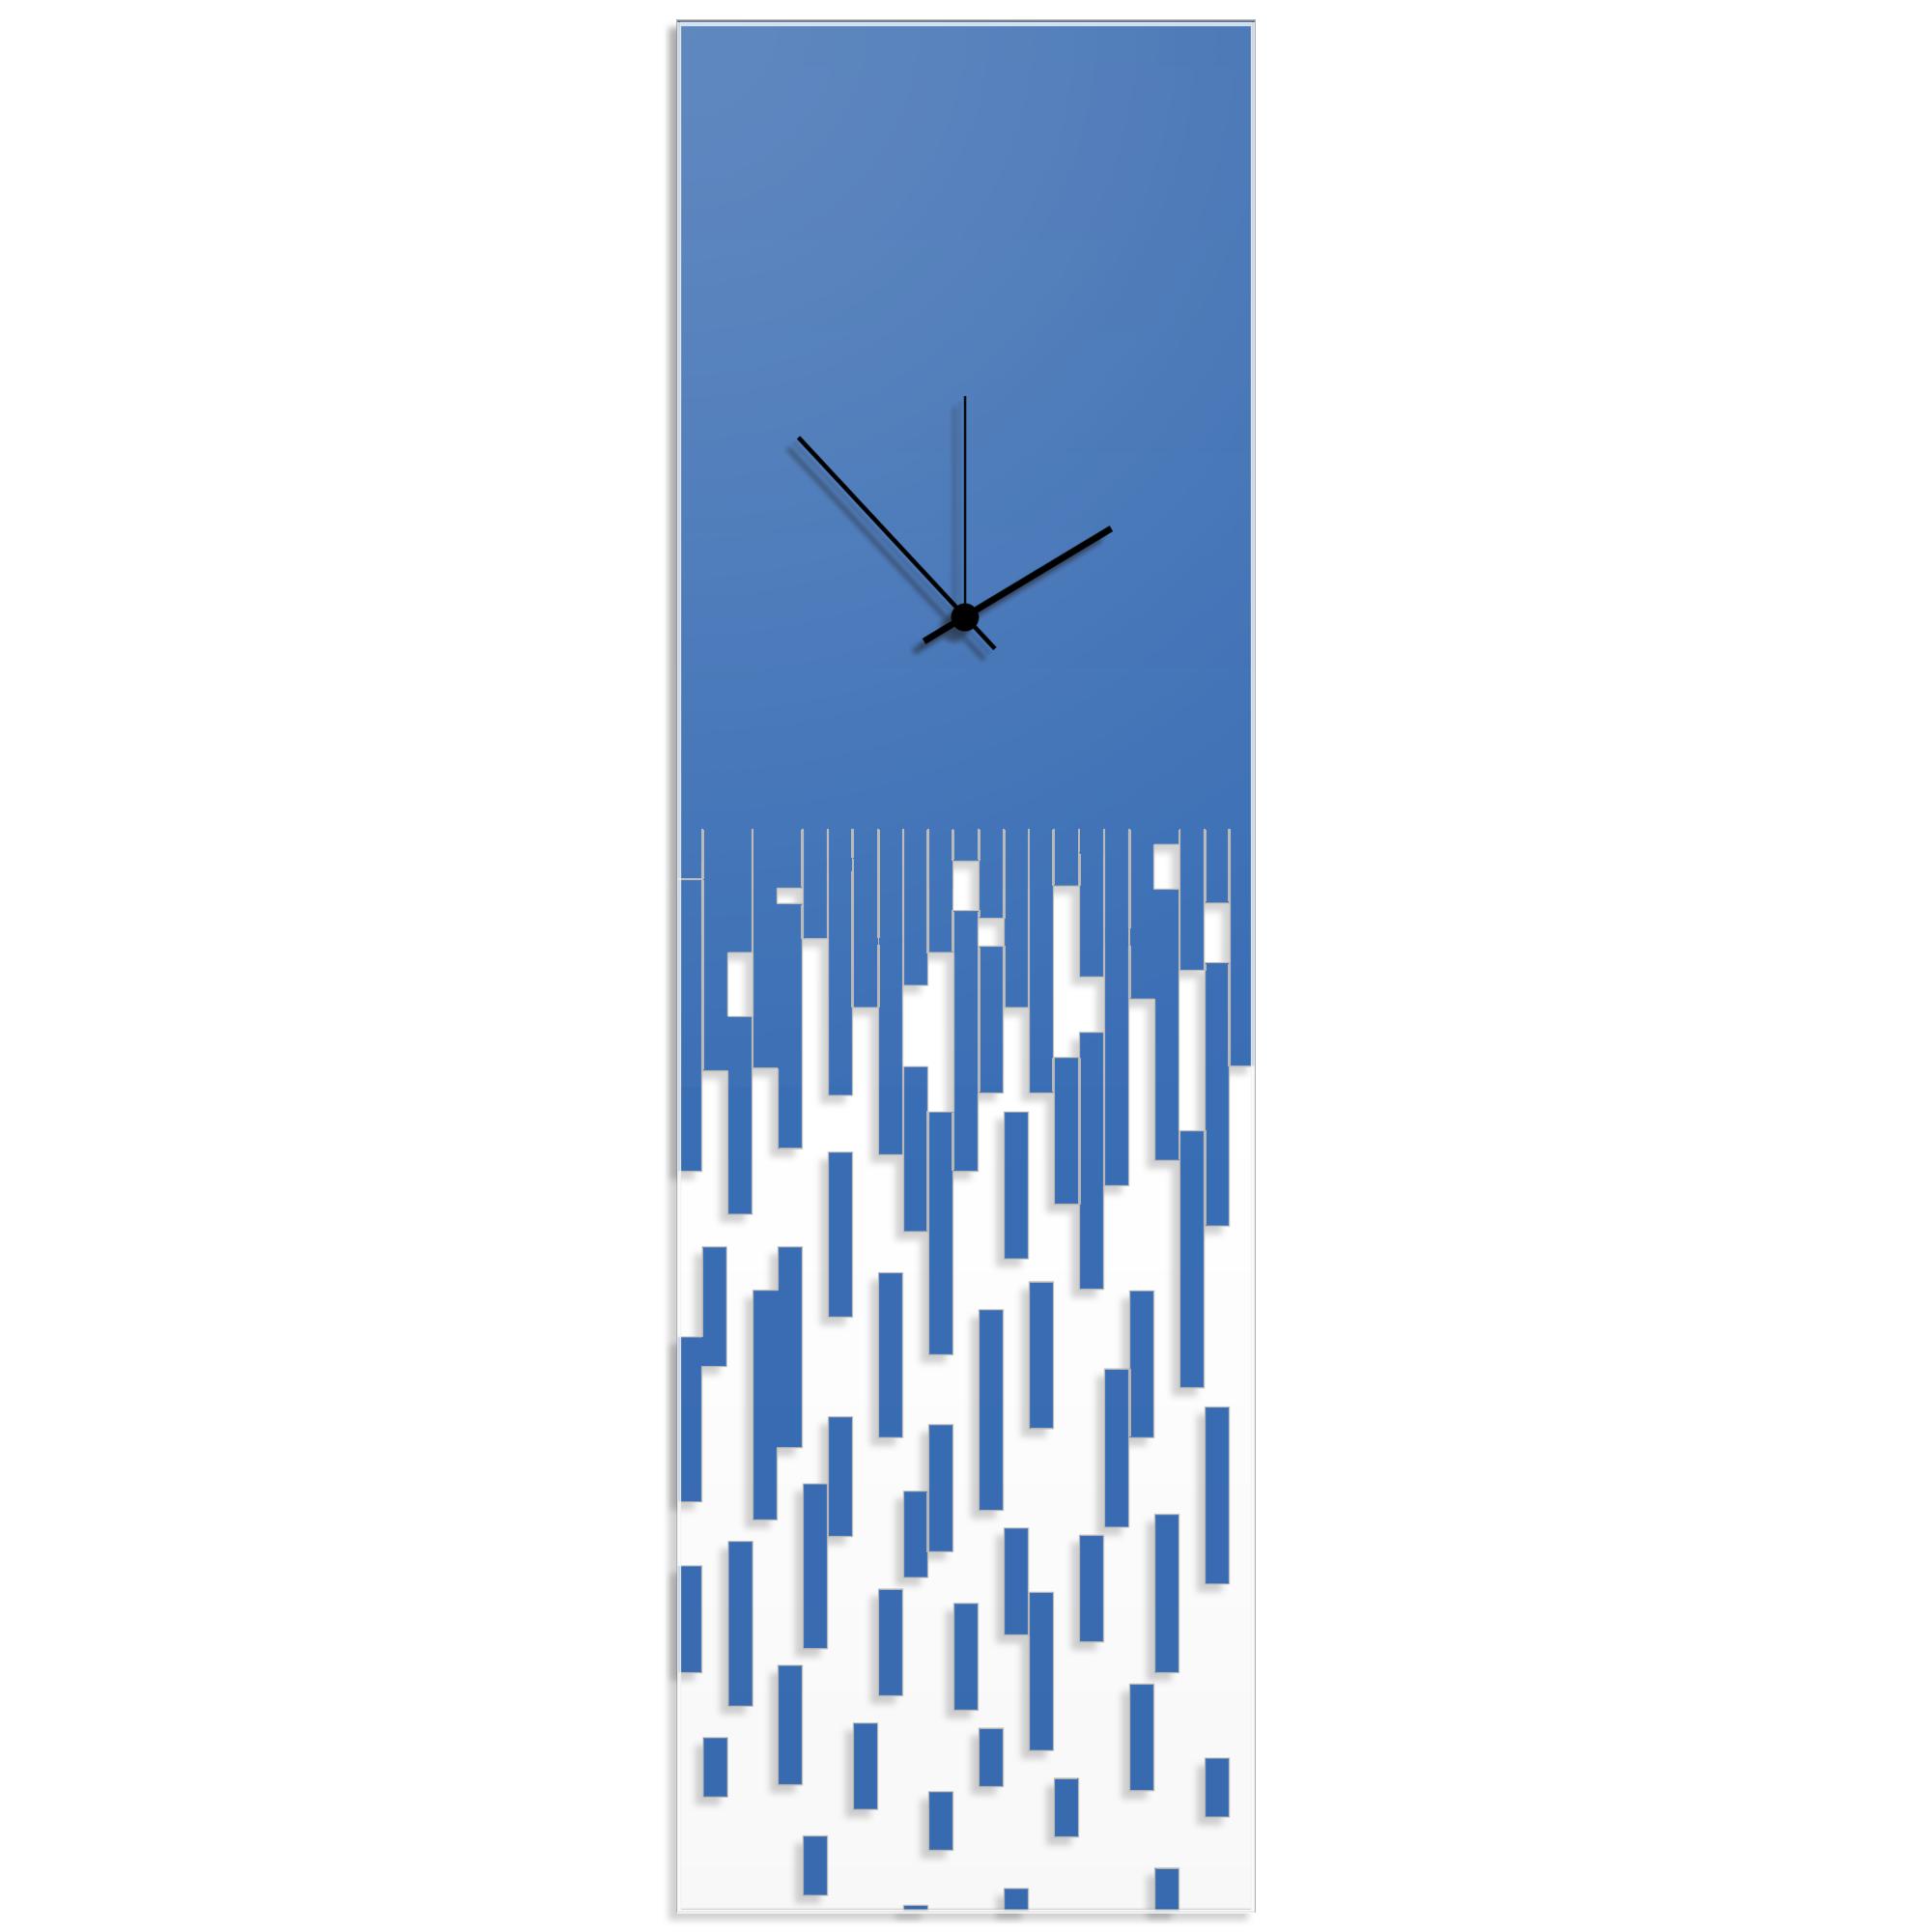 Blue Pixelated Clock by Adam Schwoeppe Surreal Wall Clock on Acrylic